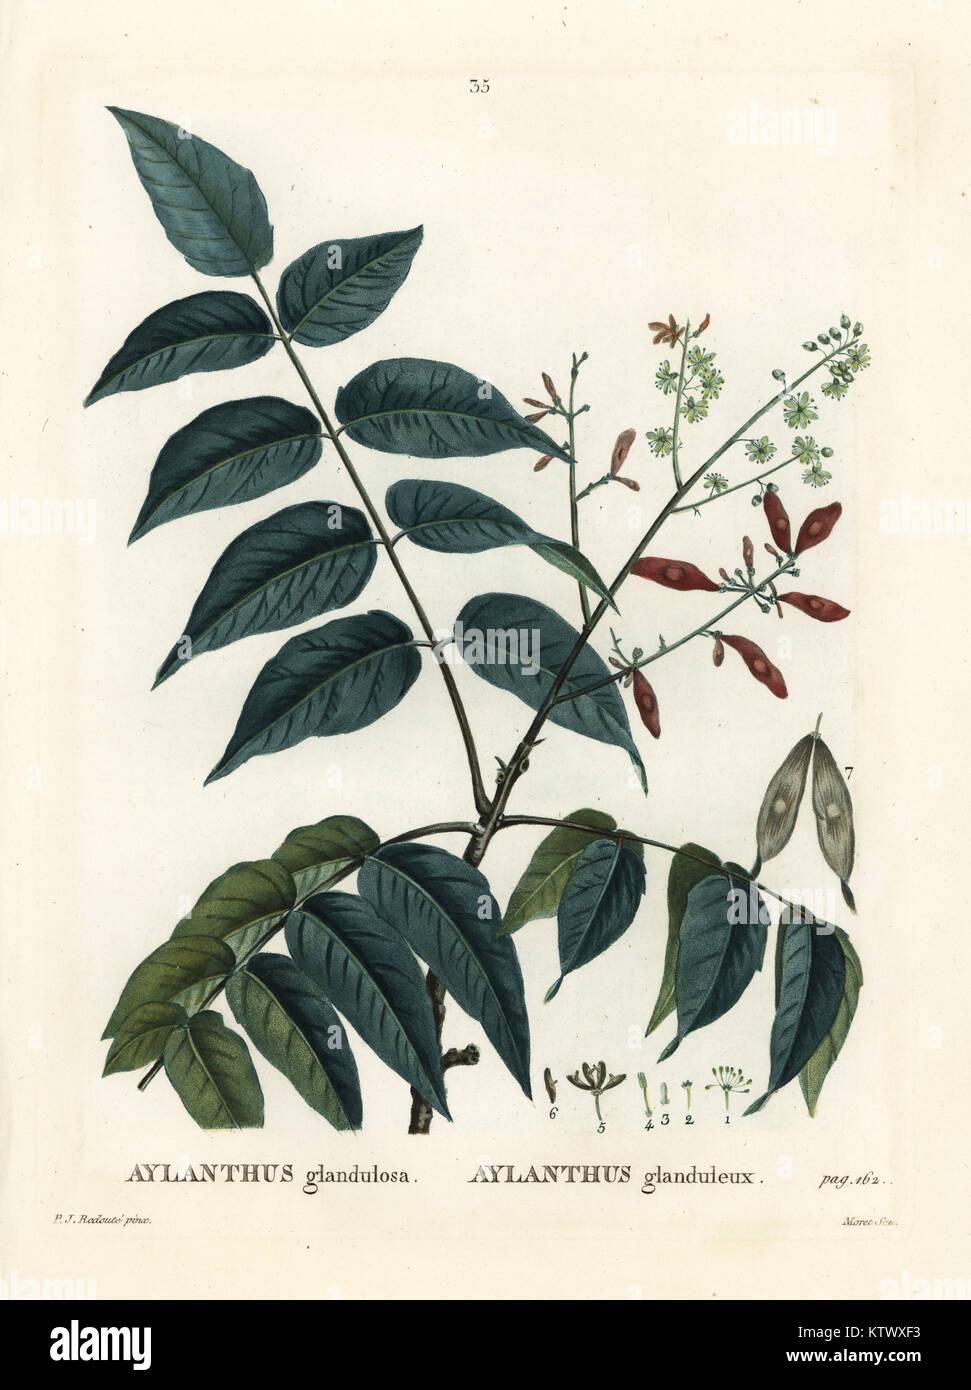 Tree of heaven, ailanthus or chouchun, Ailanthus altissima (Aylanthus glandulosa). Handcoloured stipple engraving - Stock Image